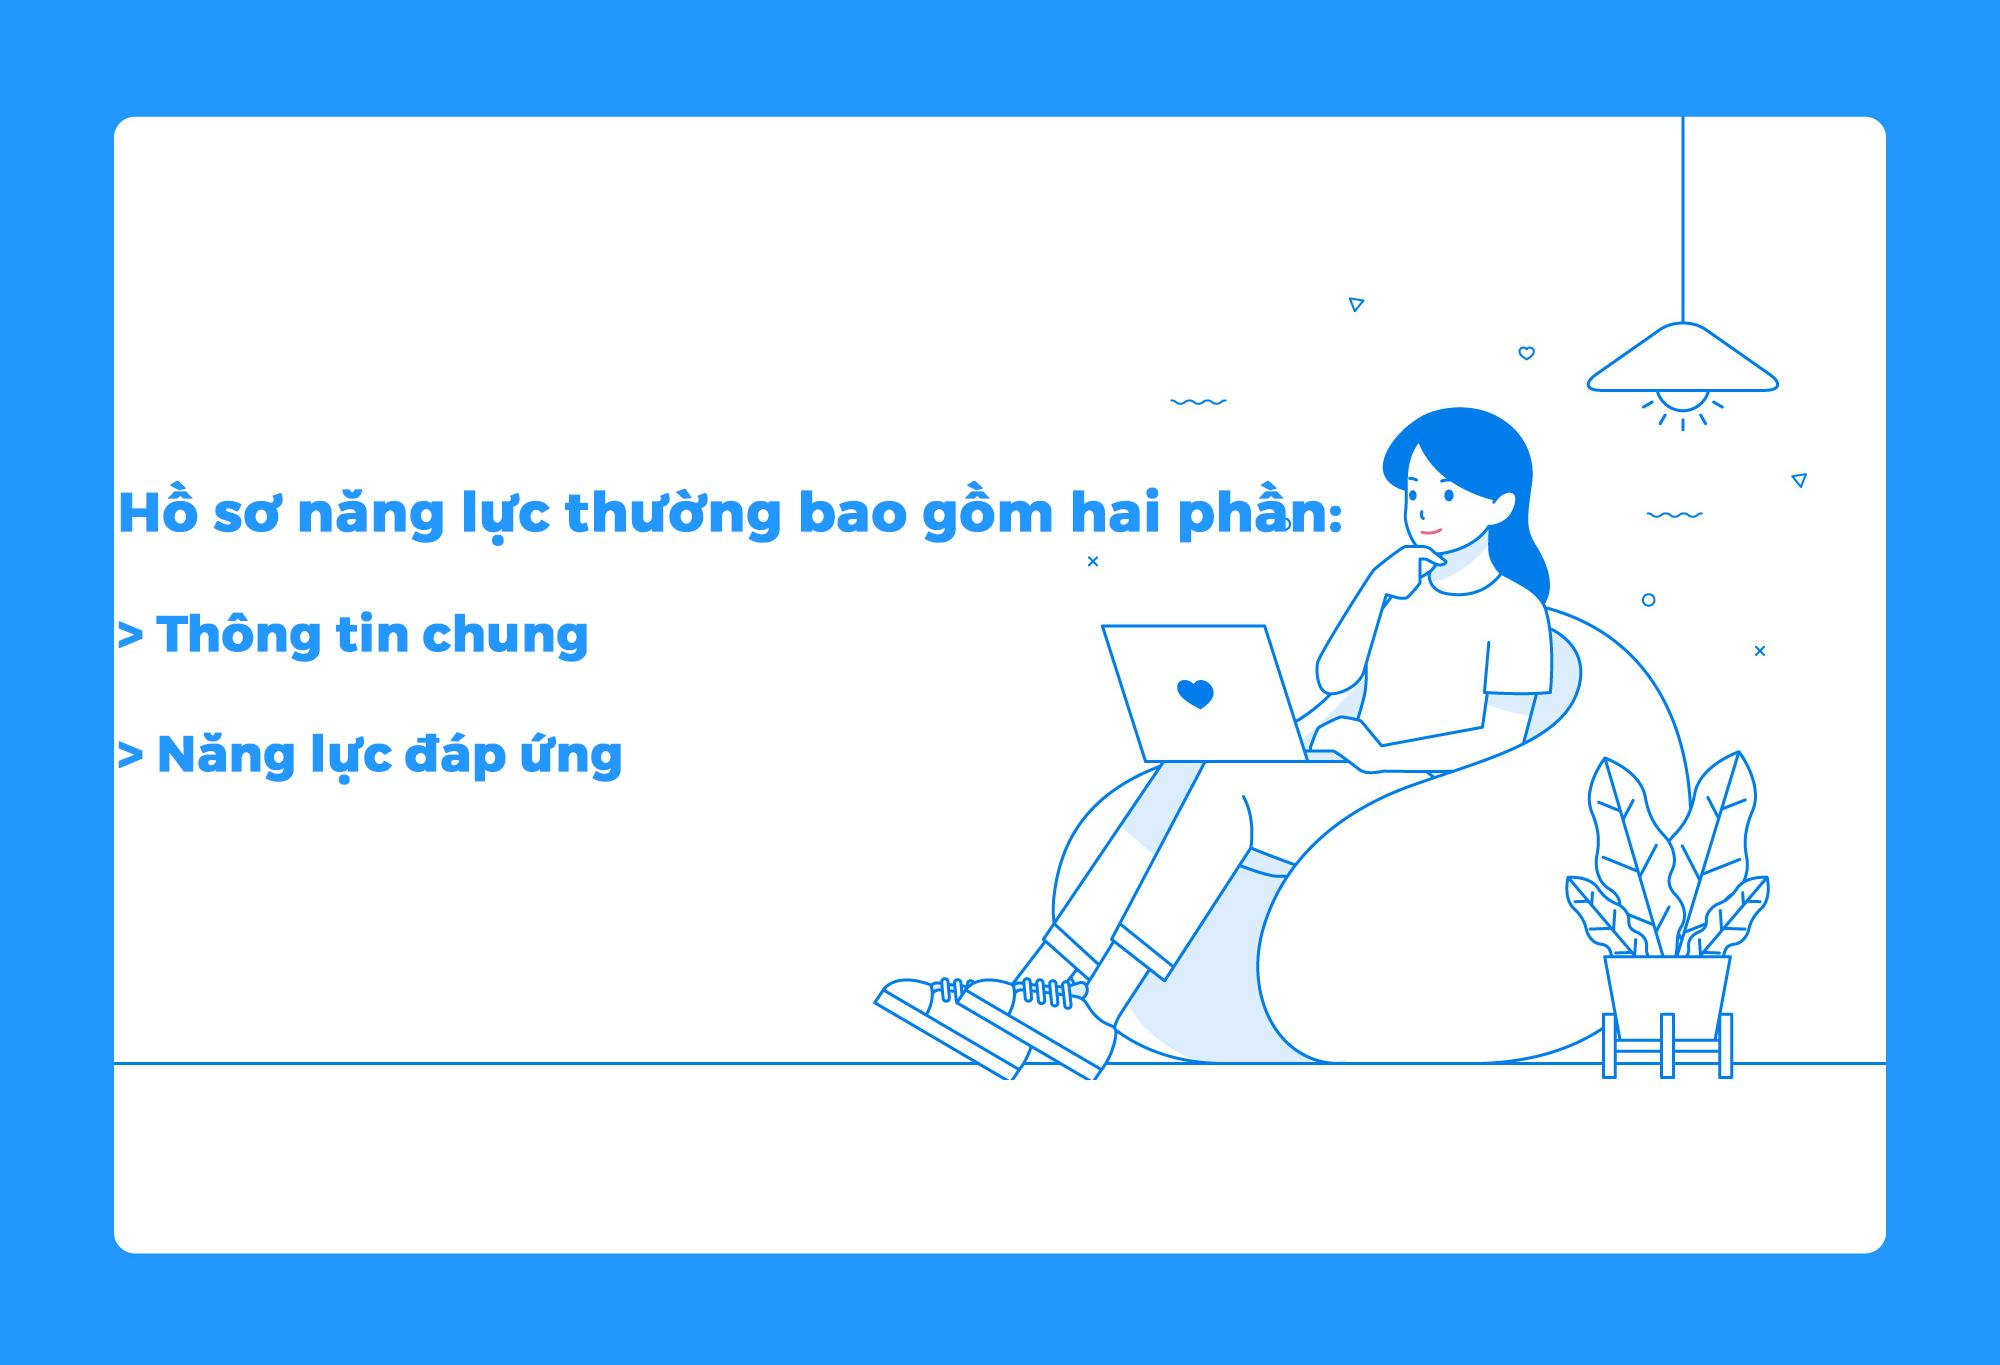 Ho_so_nang_luc_gom_nhung_gi